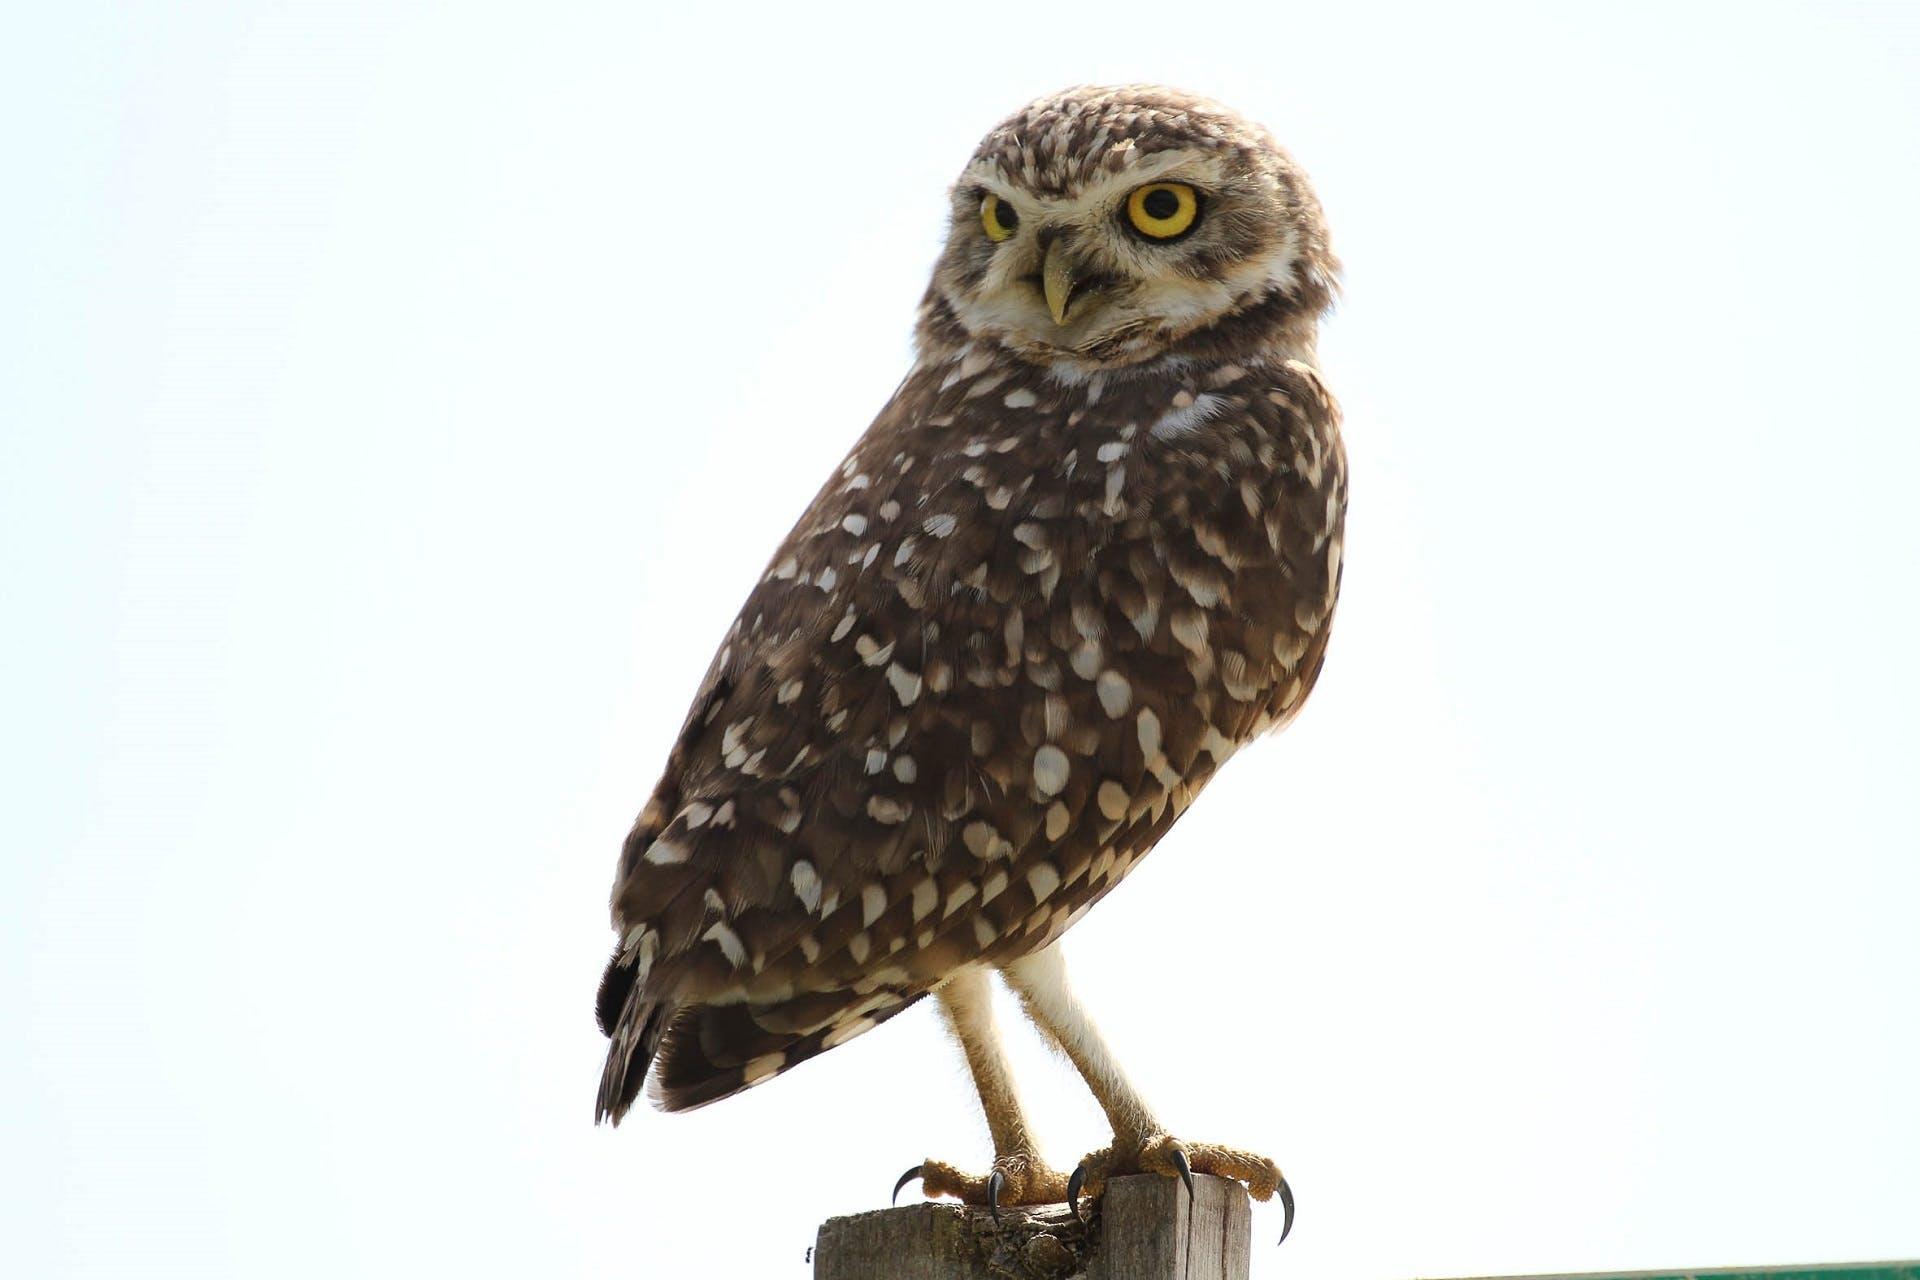 Free stock photo of nature, bird, eyes, looking